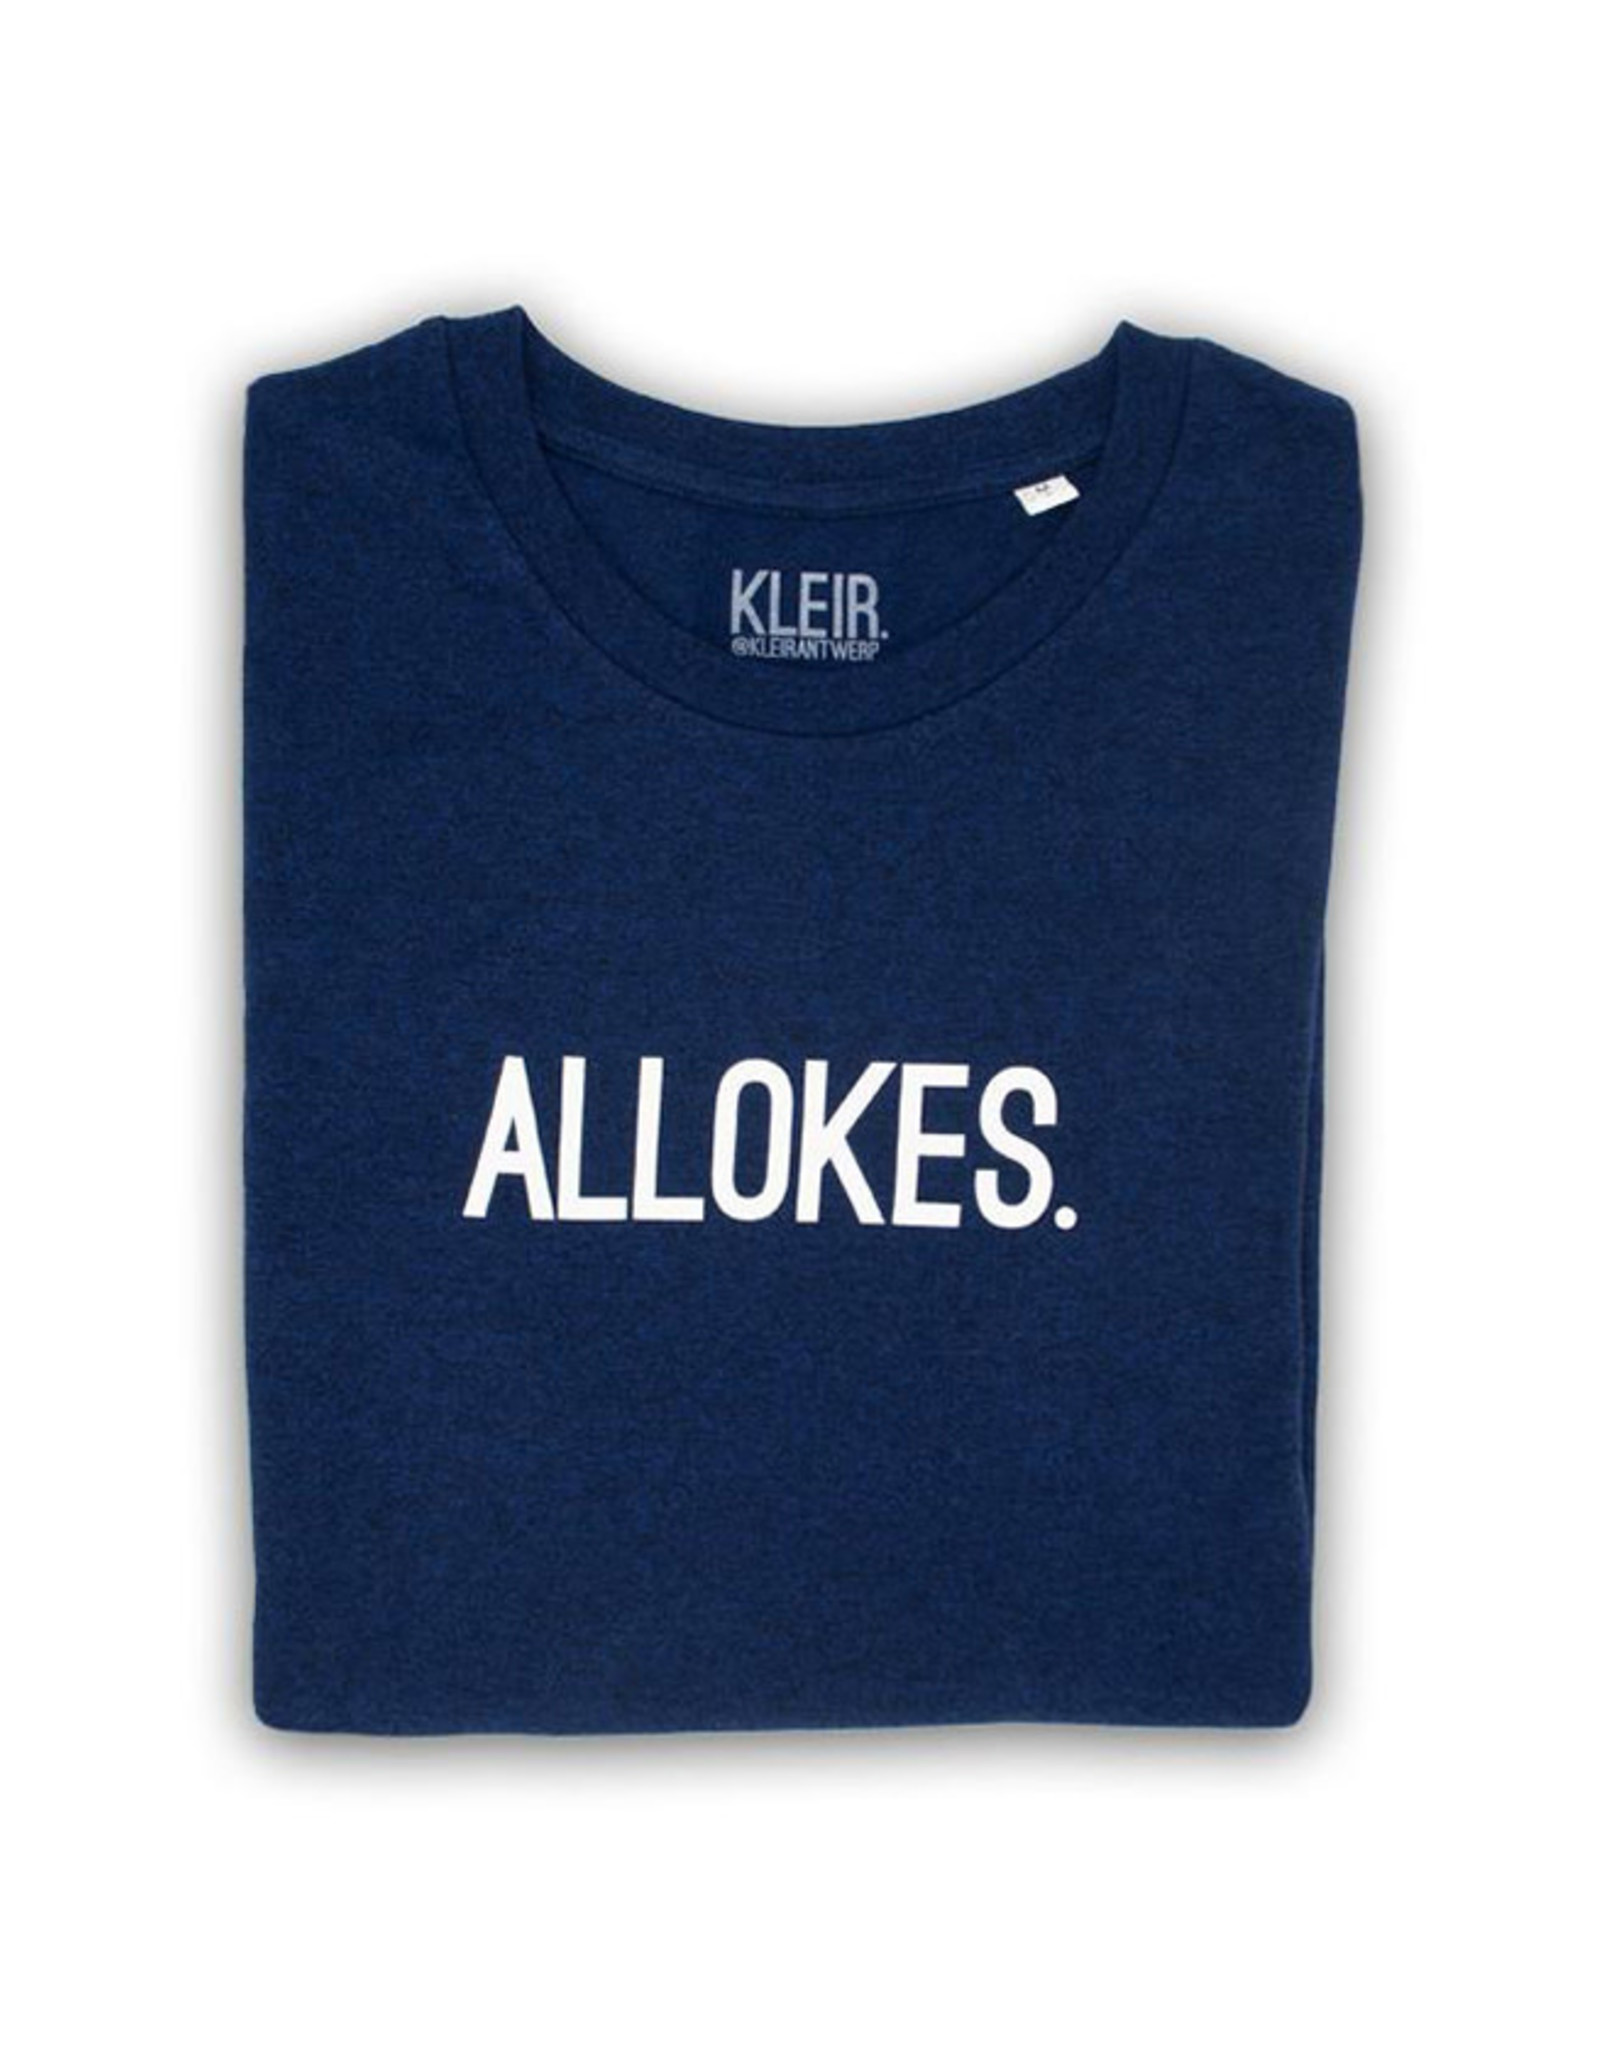 Kleir T-Shirt Kinderen Biokatoen ALLOKES-blauw